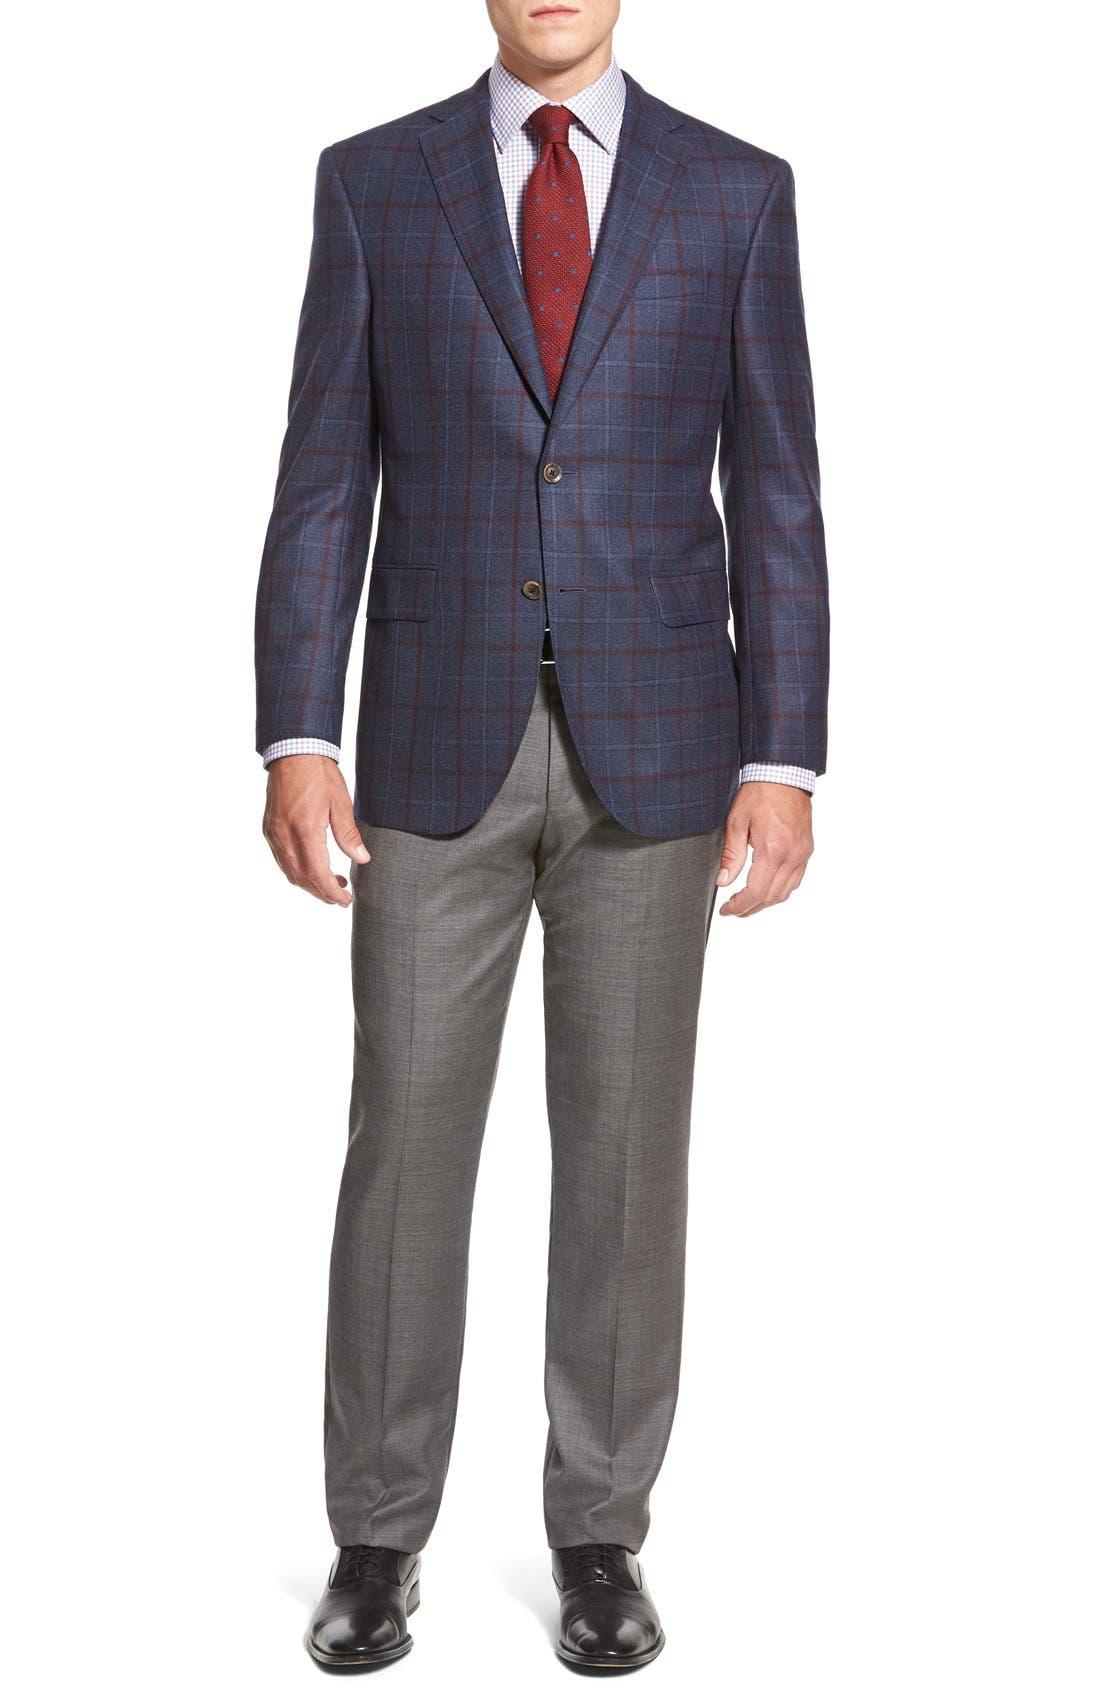 ZZDNUHUGO BOSS,                             BOSS HUGO BOSS 'Sharp' Flat Front Wool Trousers,                             Alternate thumbnail 4, color,                             001